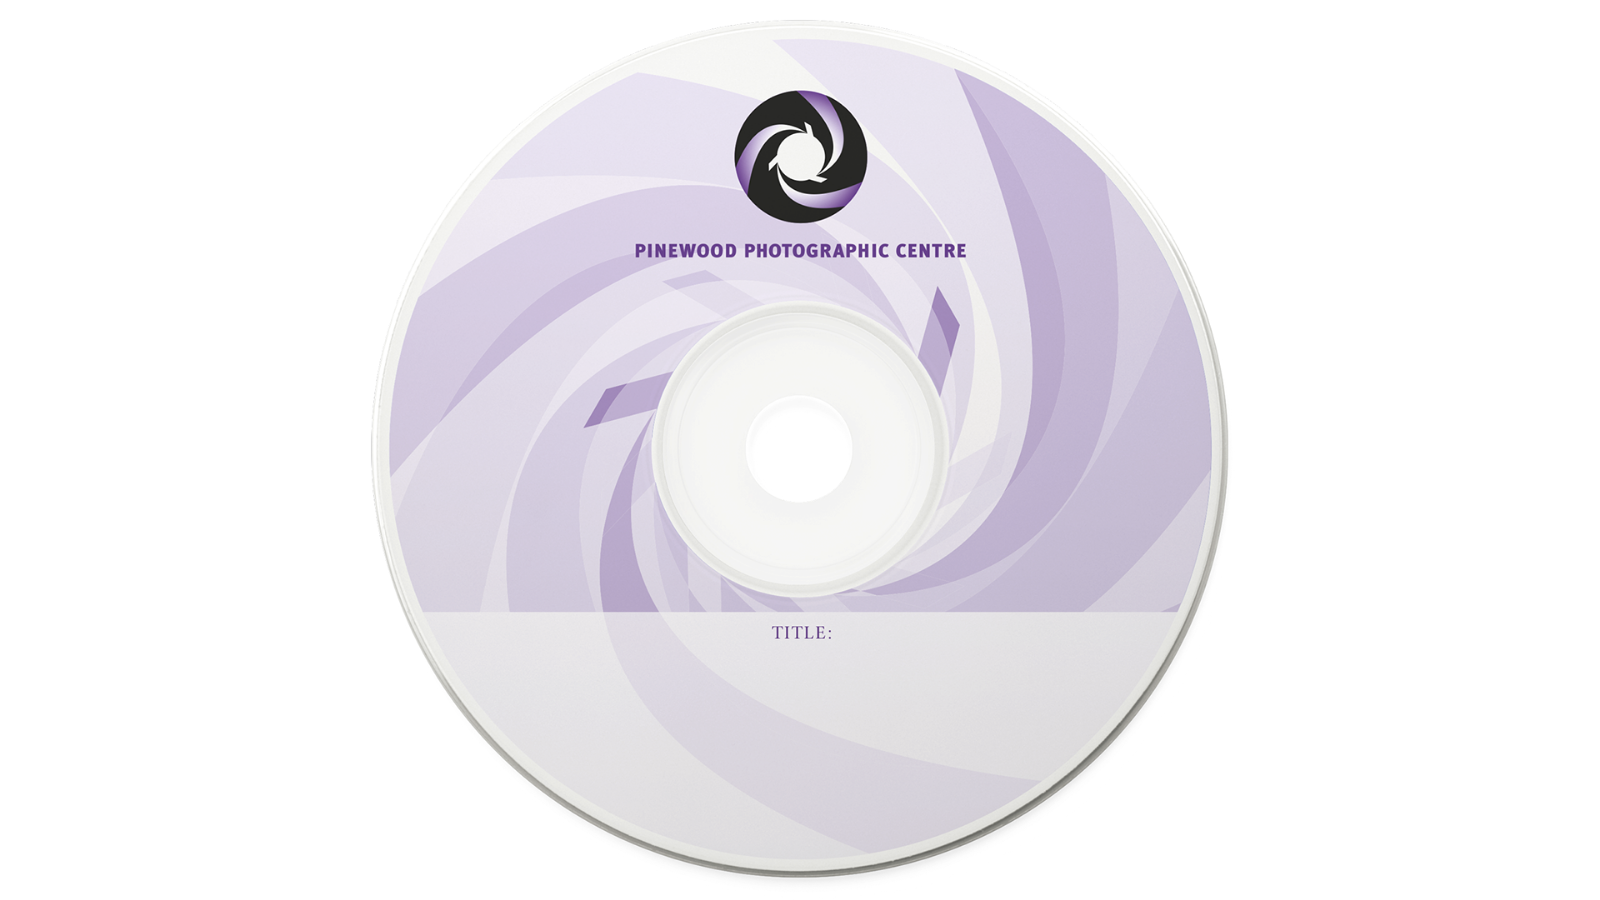 Pinewood Photographic Centre CD-ROM